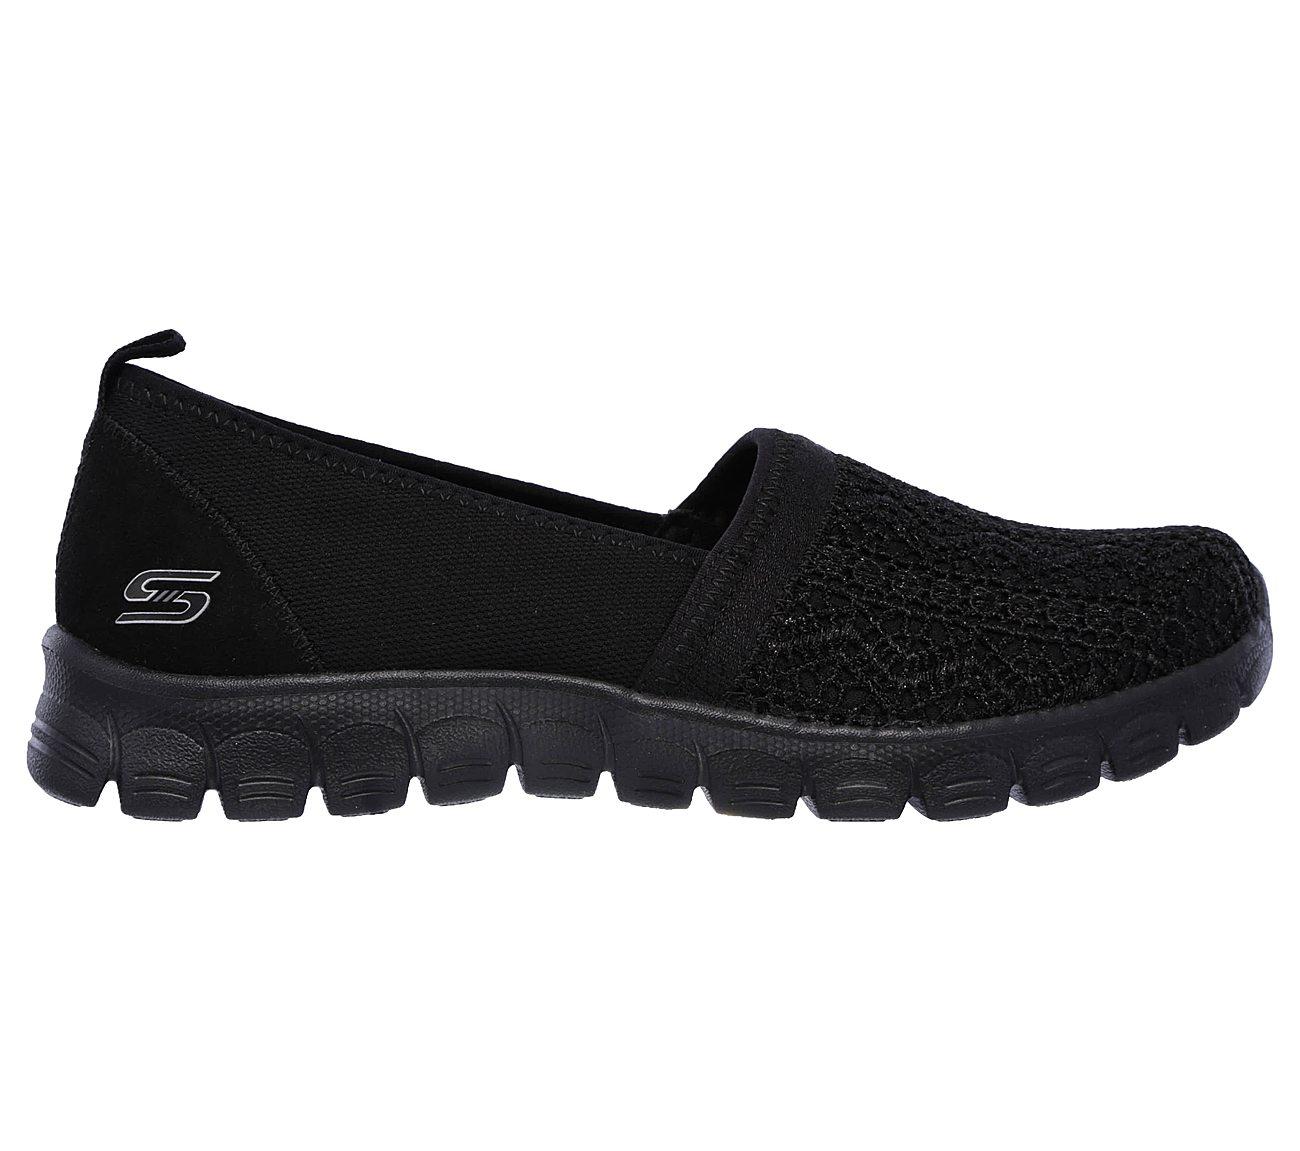 Skechers EZ Flex 3.0 Duchess Damen Sneaker Slipper Beige